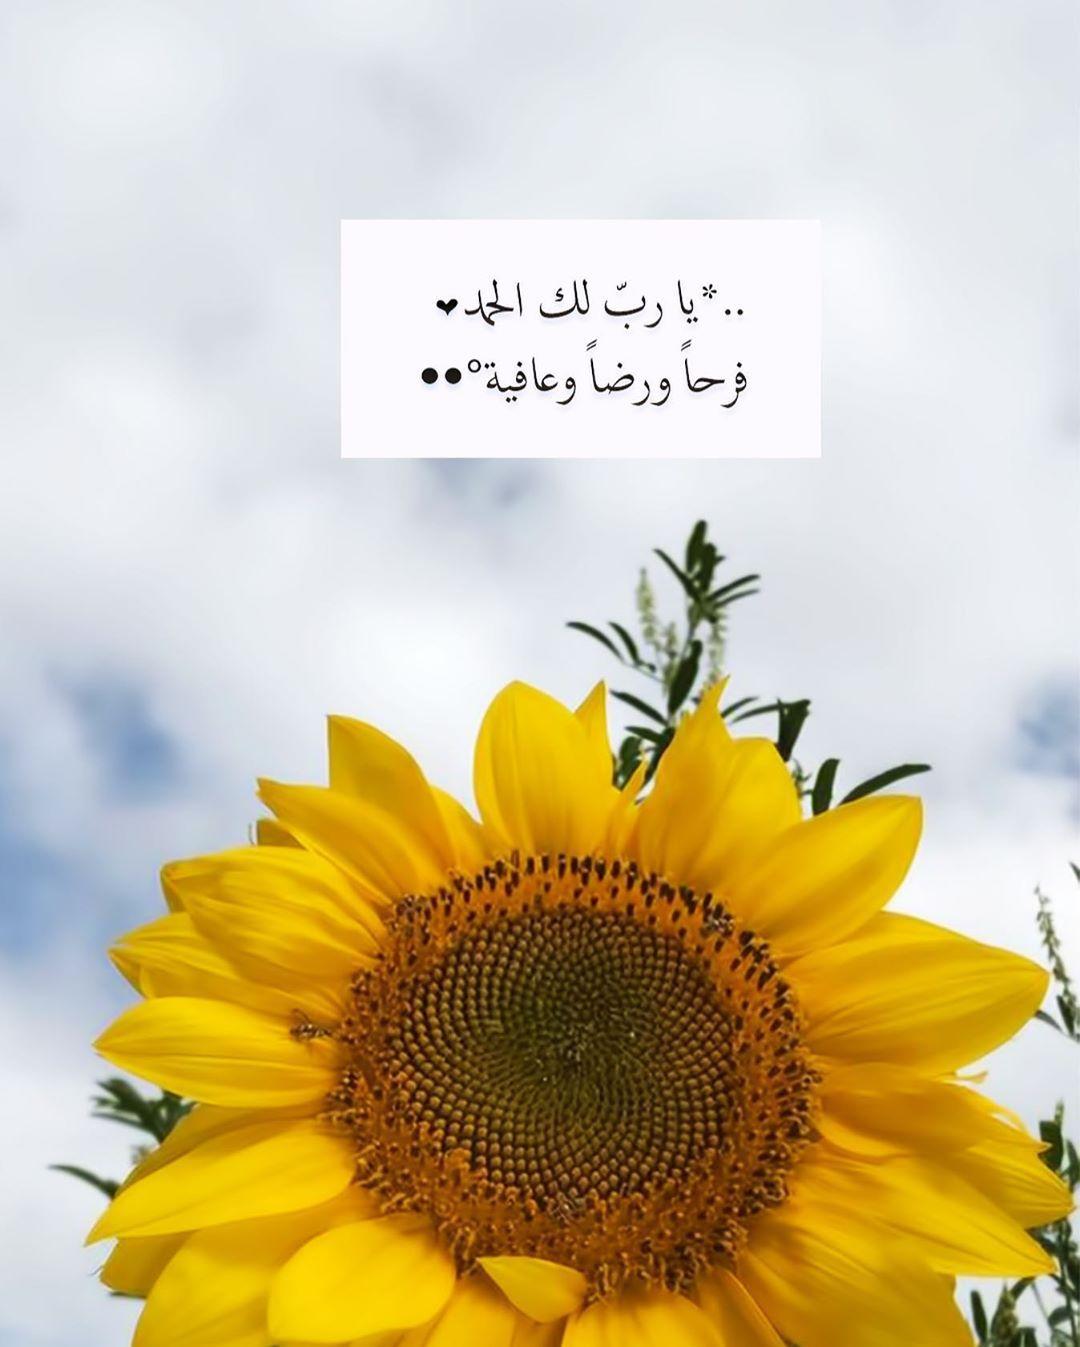 P E A R L A On Instagram ي ا رب لك الح مد ف رحا ورضا وع افيـة ㅤㅤㅤㅤㅤ ㅤㅤㅤㅤㅤ مساء ال Mom And Dad Quotes Islamic Images Flower Iphone Wallpaper